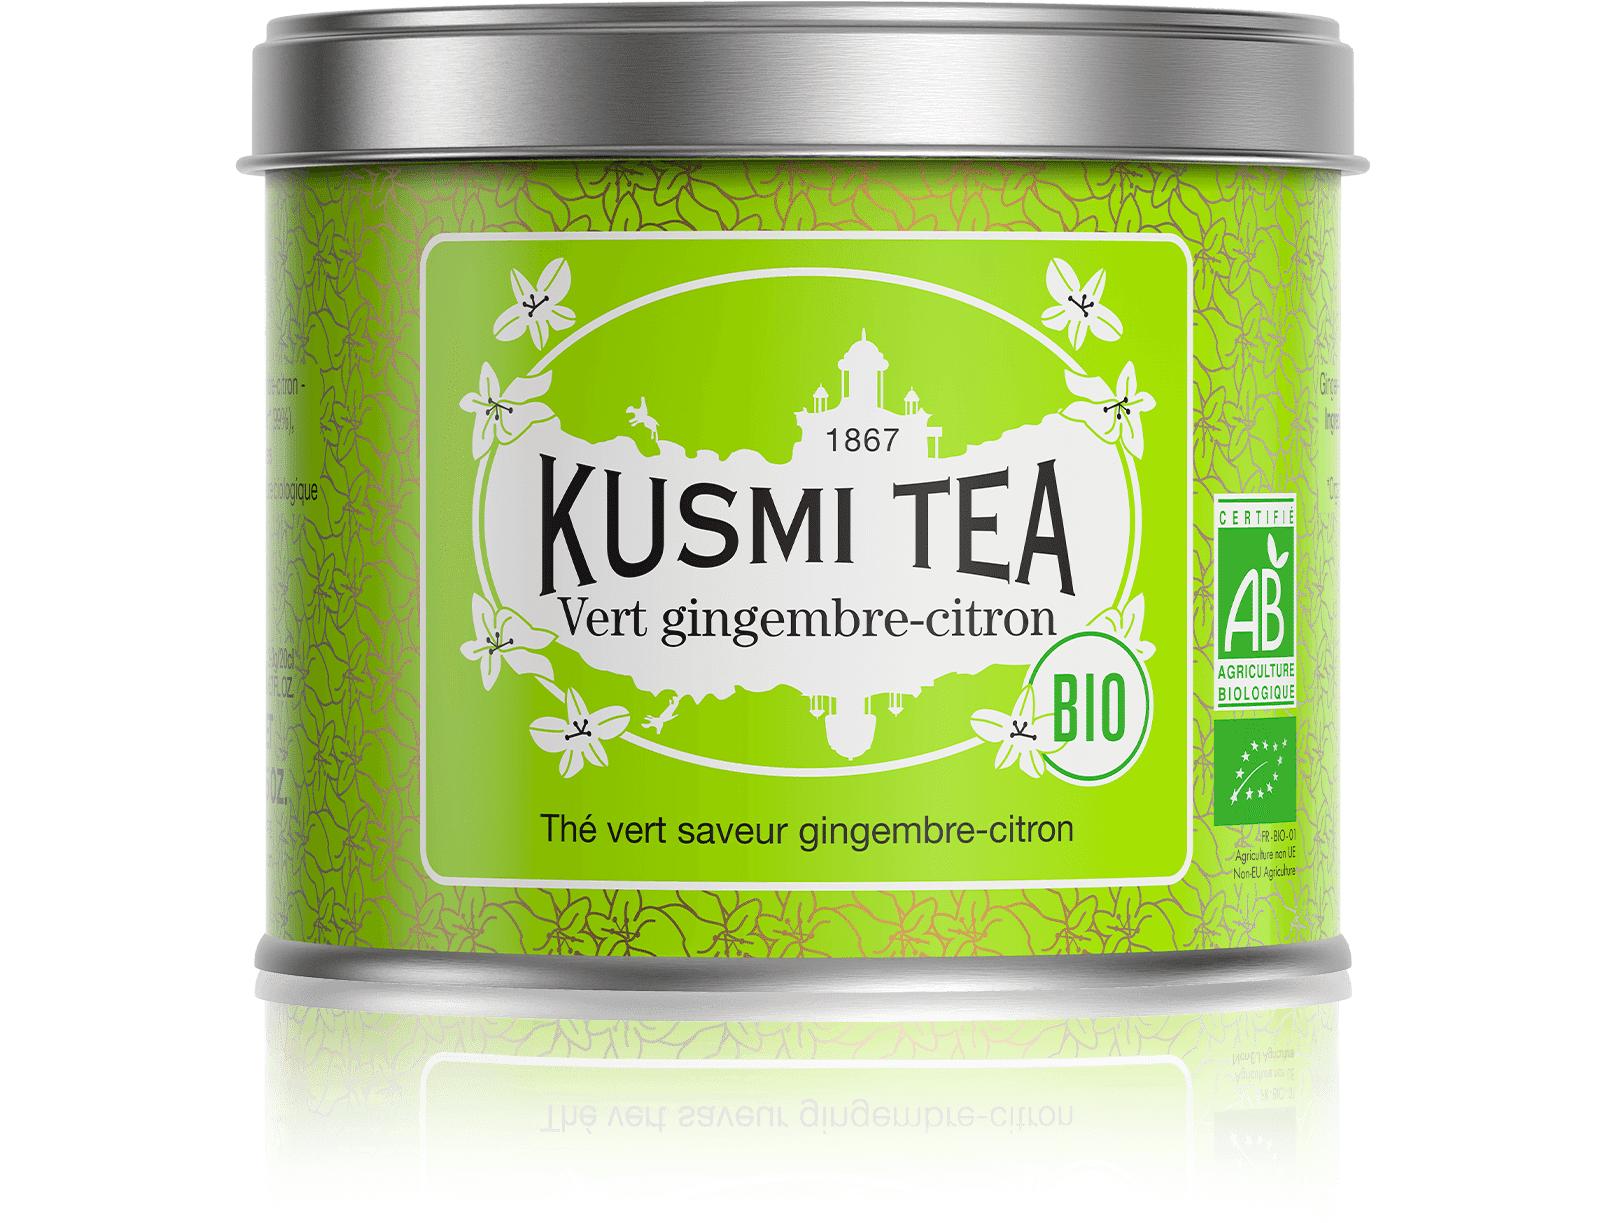 KUSMI TEA Vert gingembre-citron bio - Thé vert, gingembre, citron - Boîte de thé en vrac - Kusmi Tea